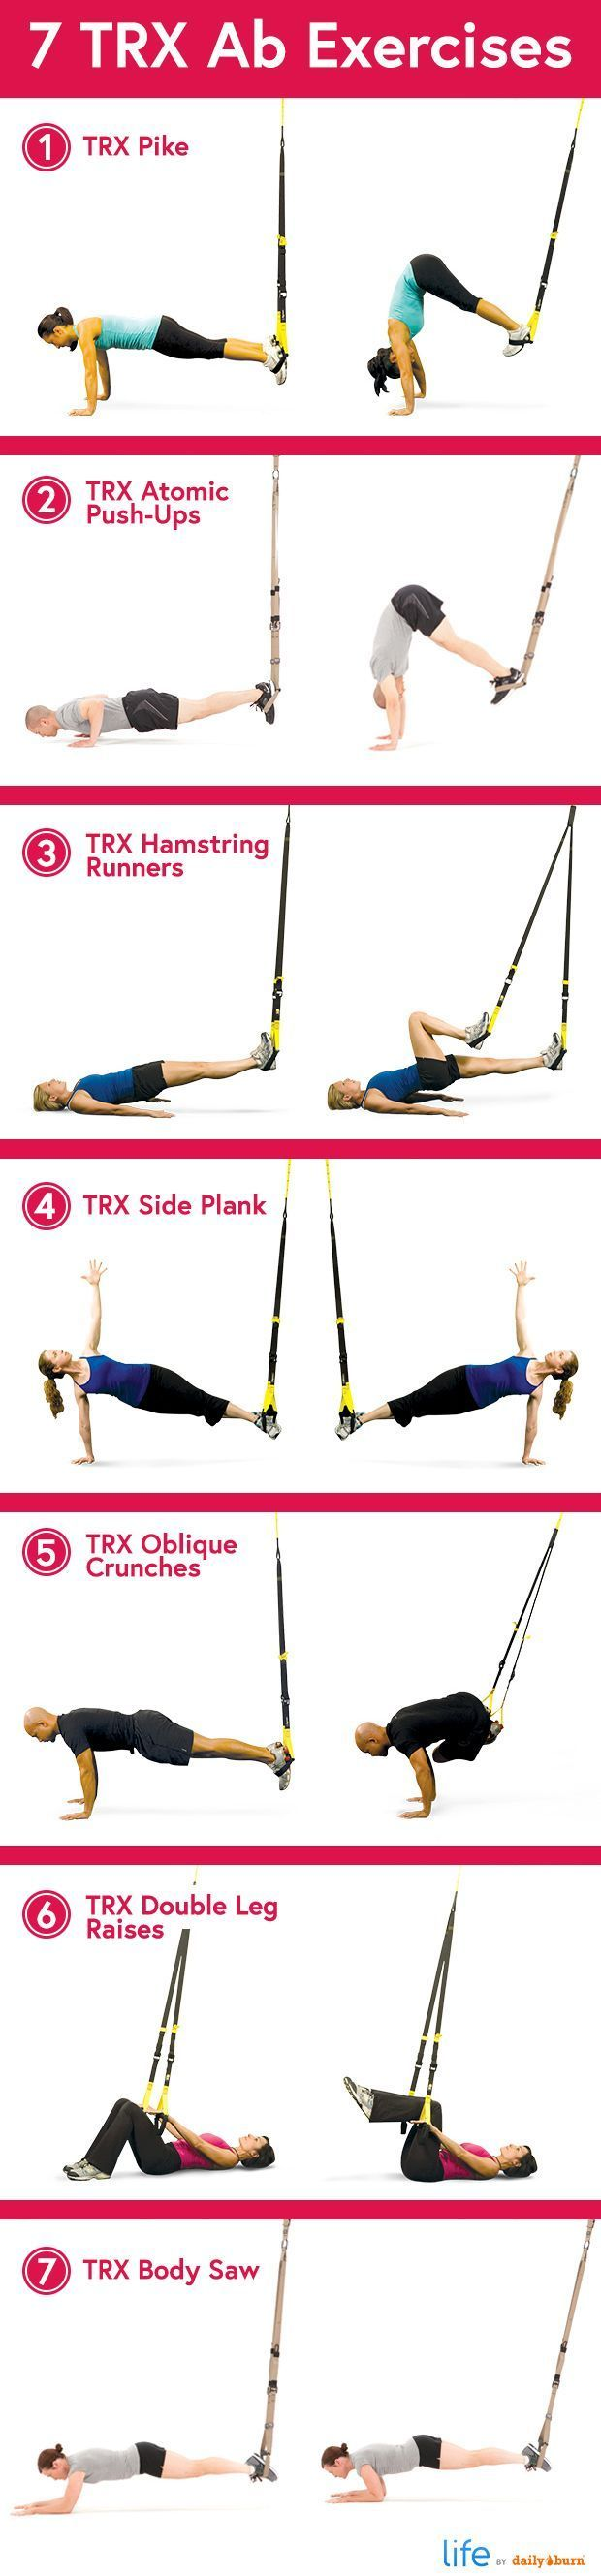 7 TRX Ab Exercises